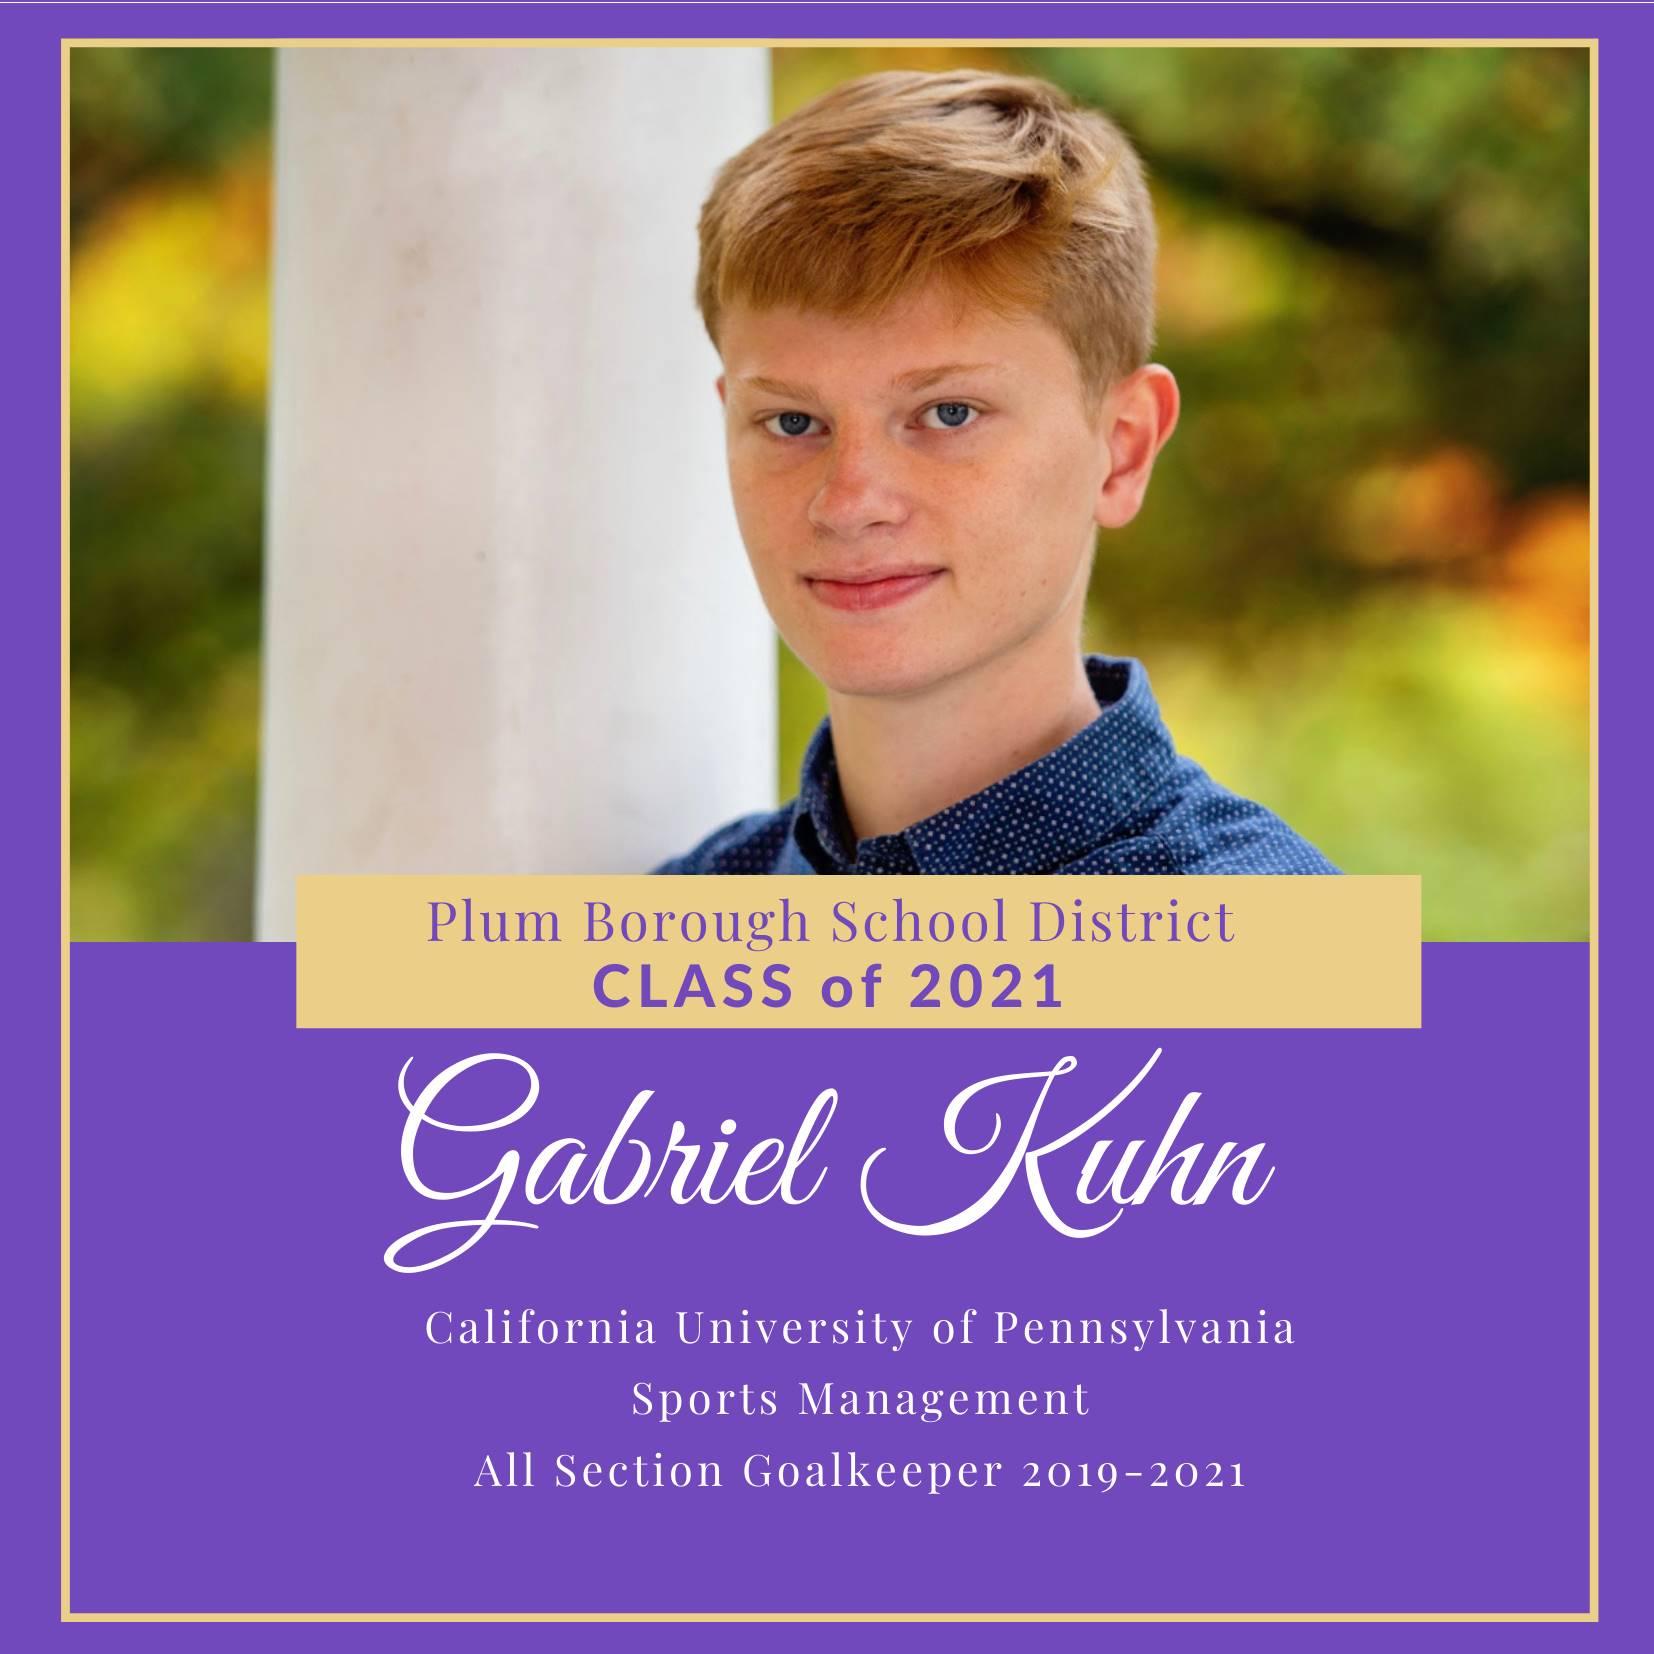 Congratulations to Gabriel Kuhn, Class of 2021!